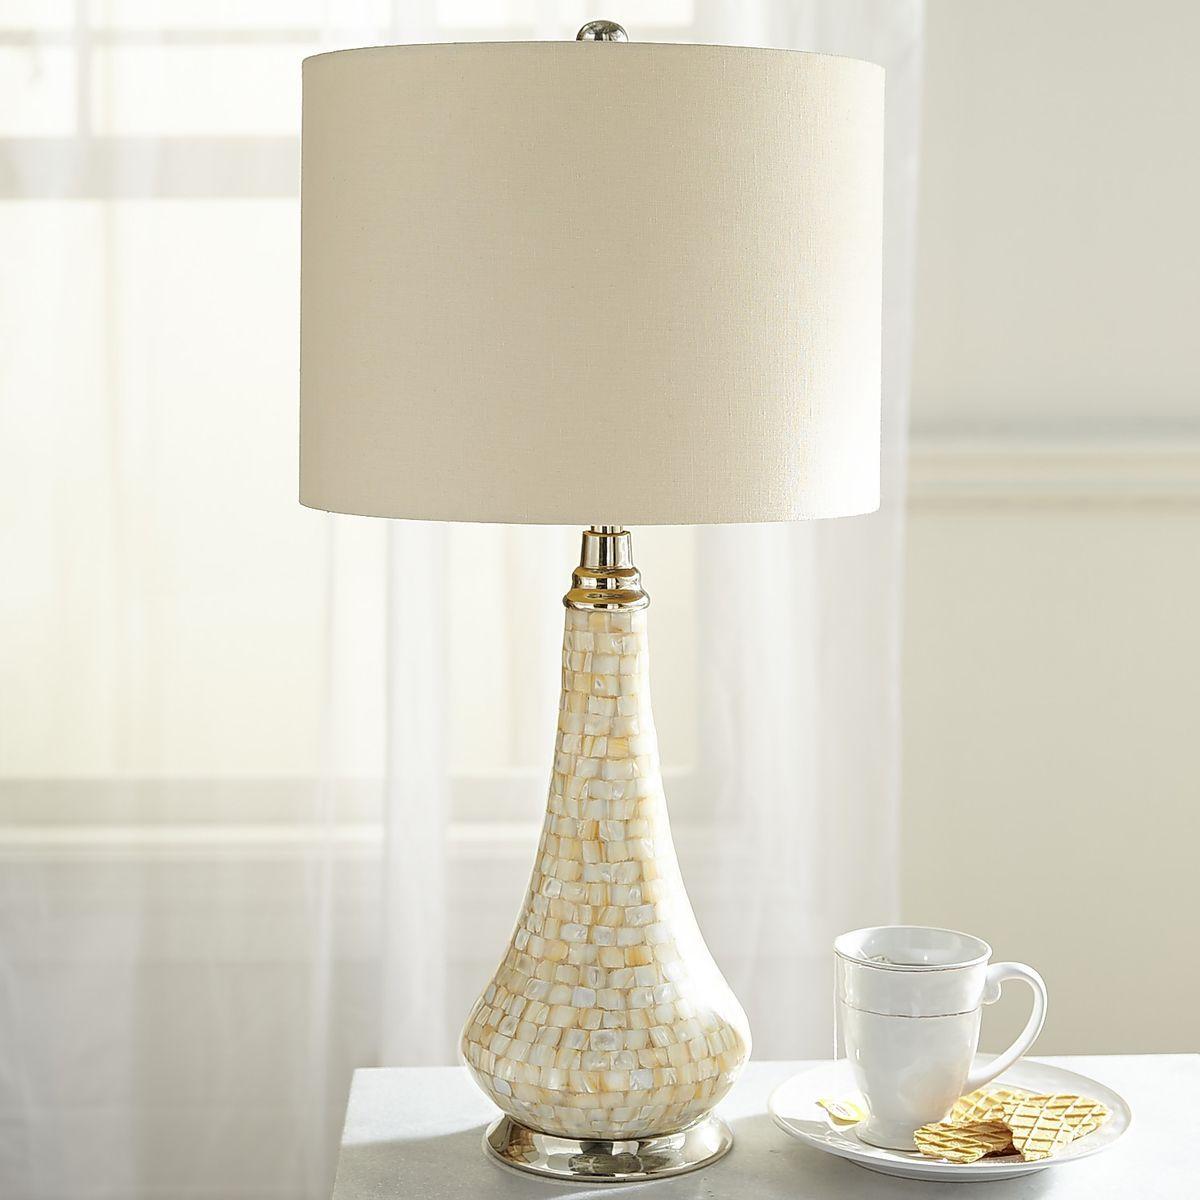 Safavieh Lighting 22-inch Nikki Sea Shell Table Lamp Set Of 2